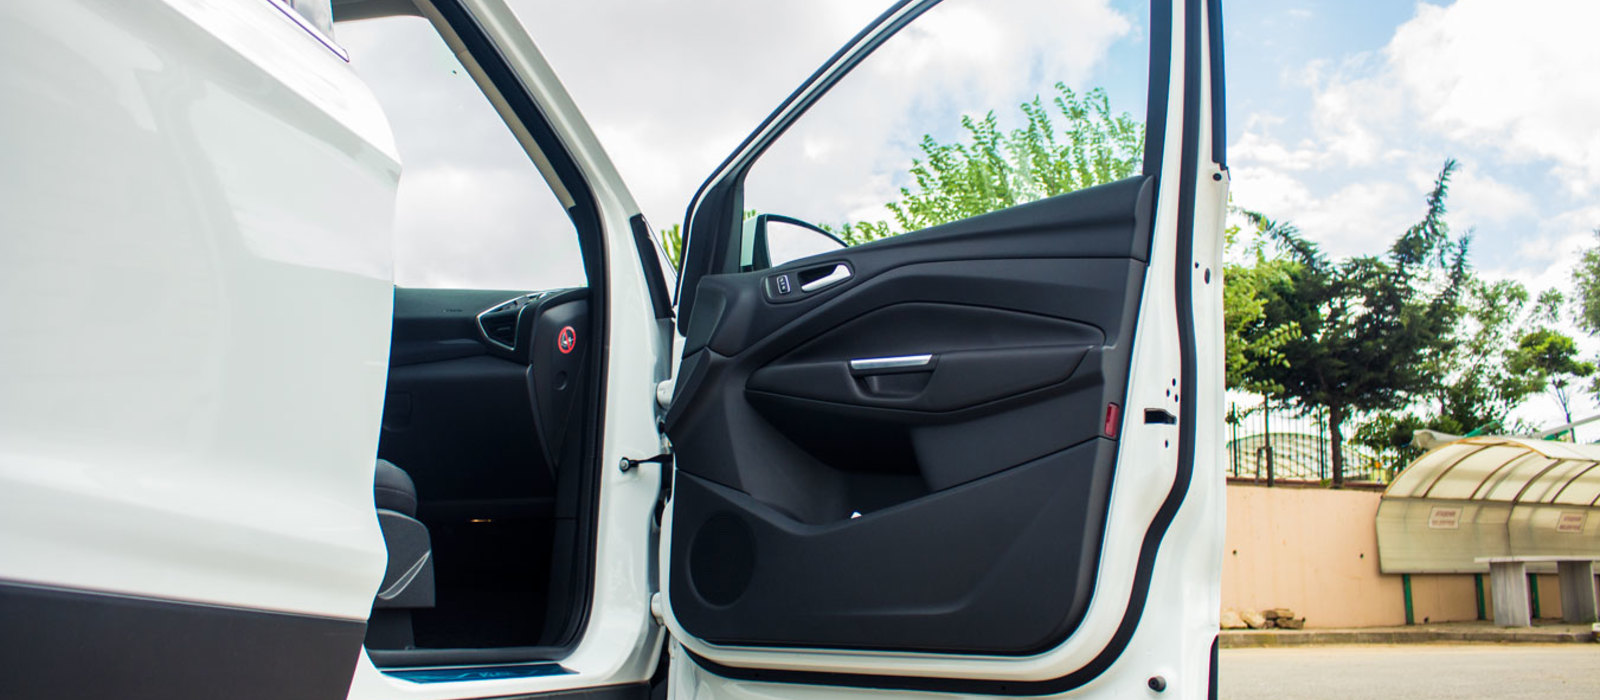 ikinci el araba 2014 Ford Kuga 1.6 EcoBoost Titanium Benzin Otomatik 14000 KM 8